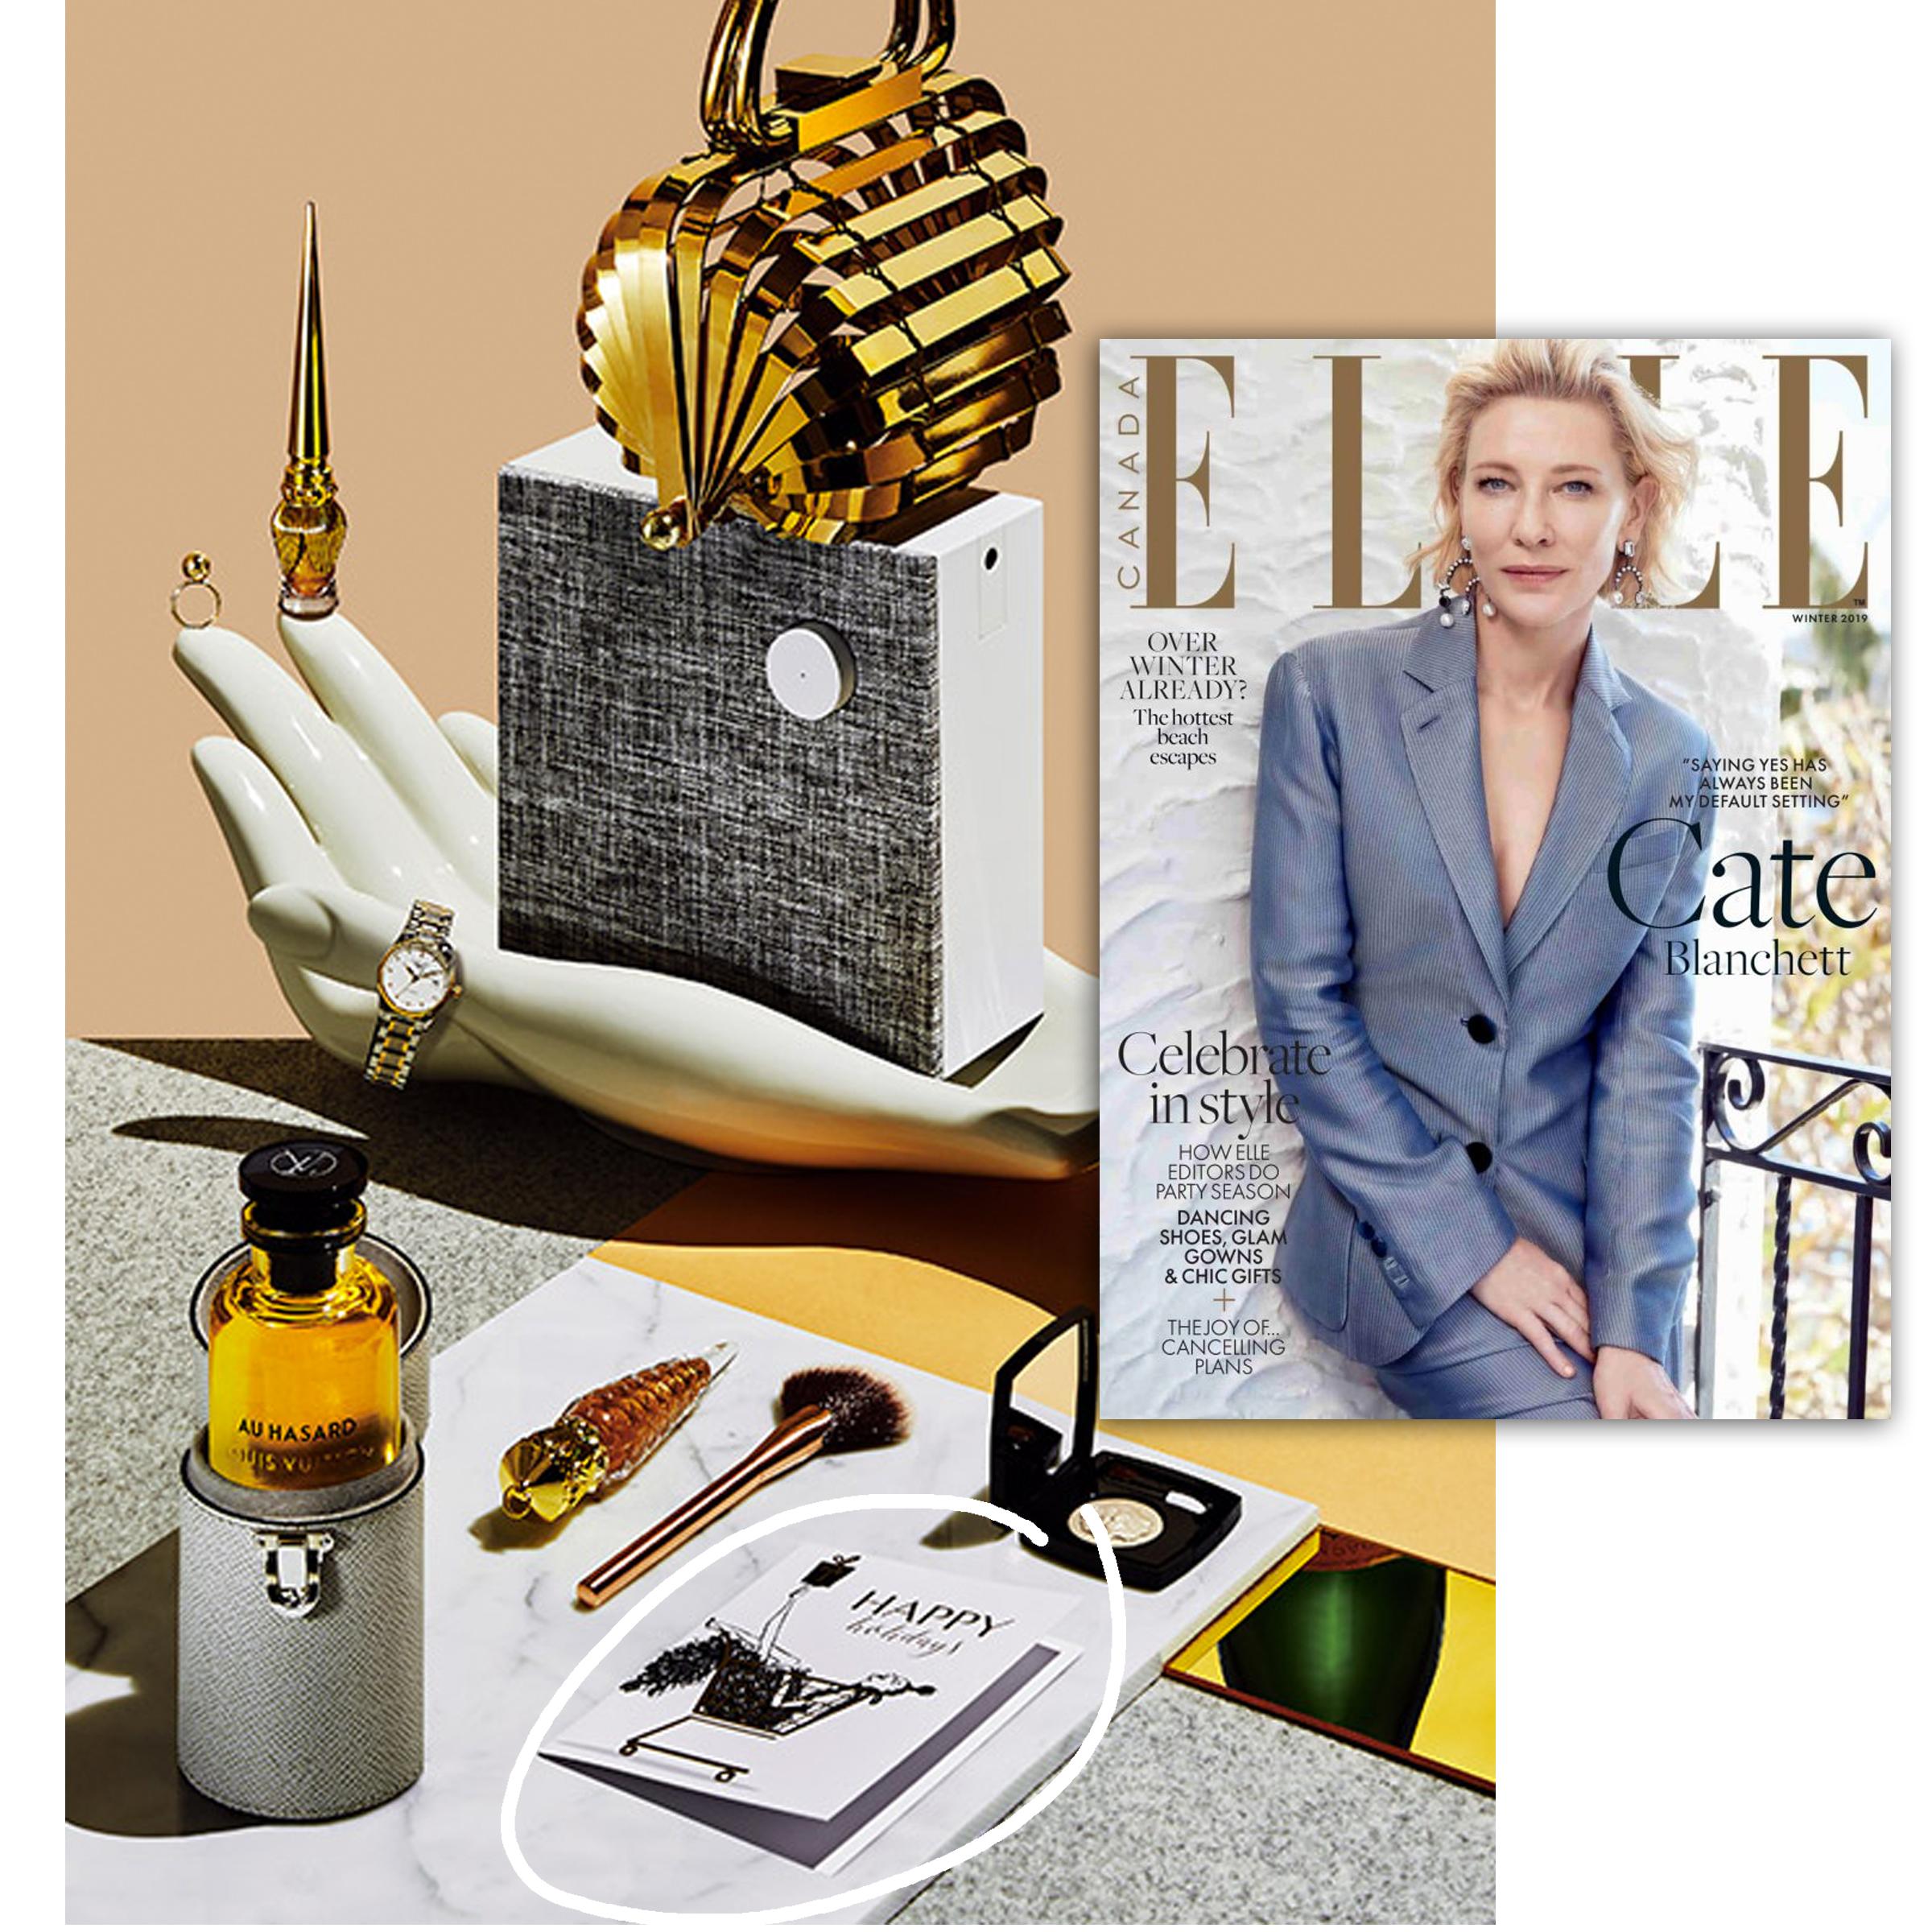 Elle Canada | December 2018